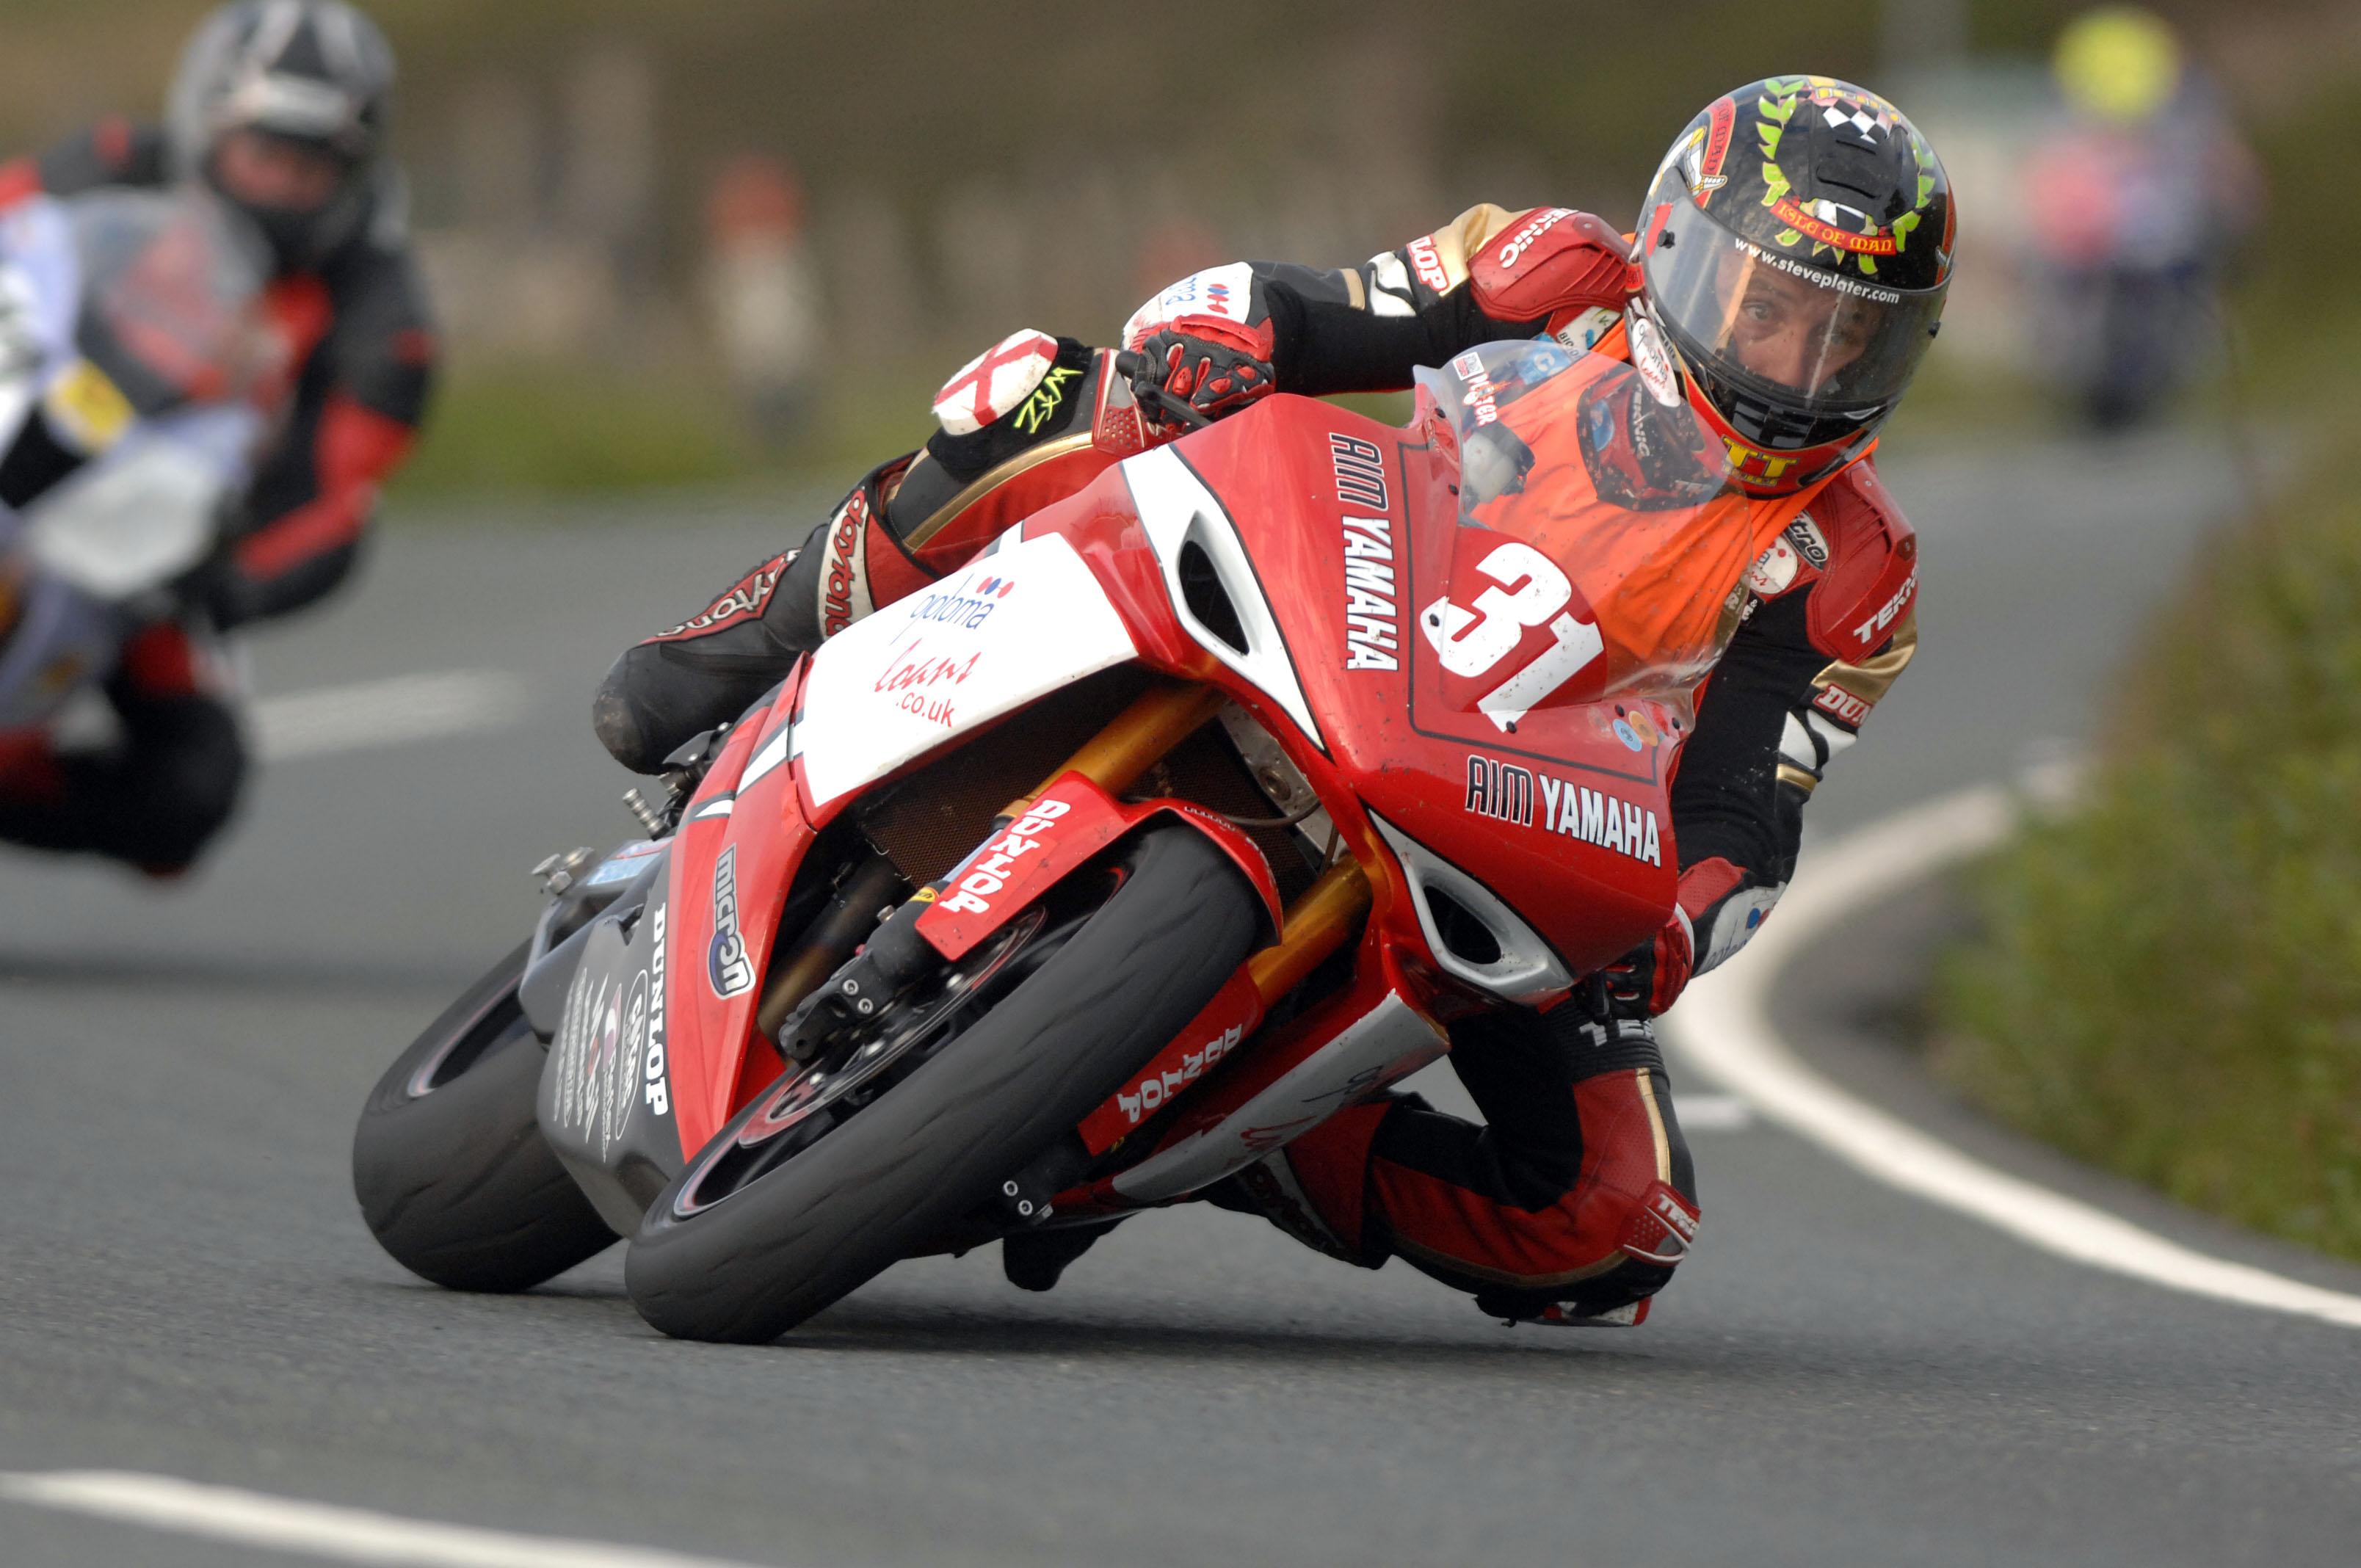 TT rookie